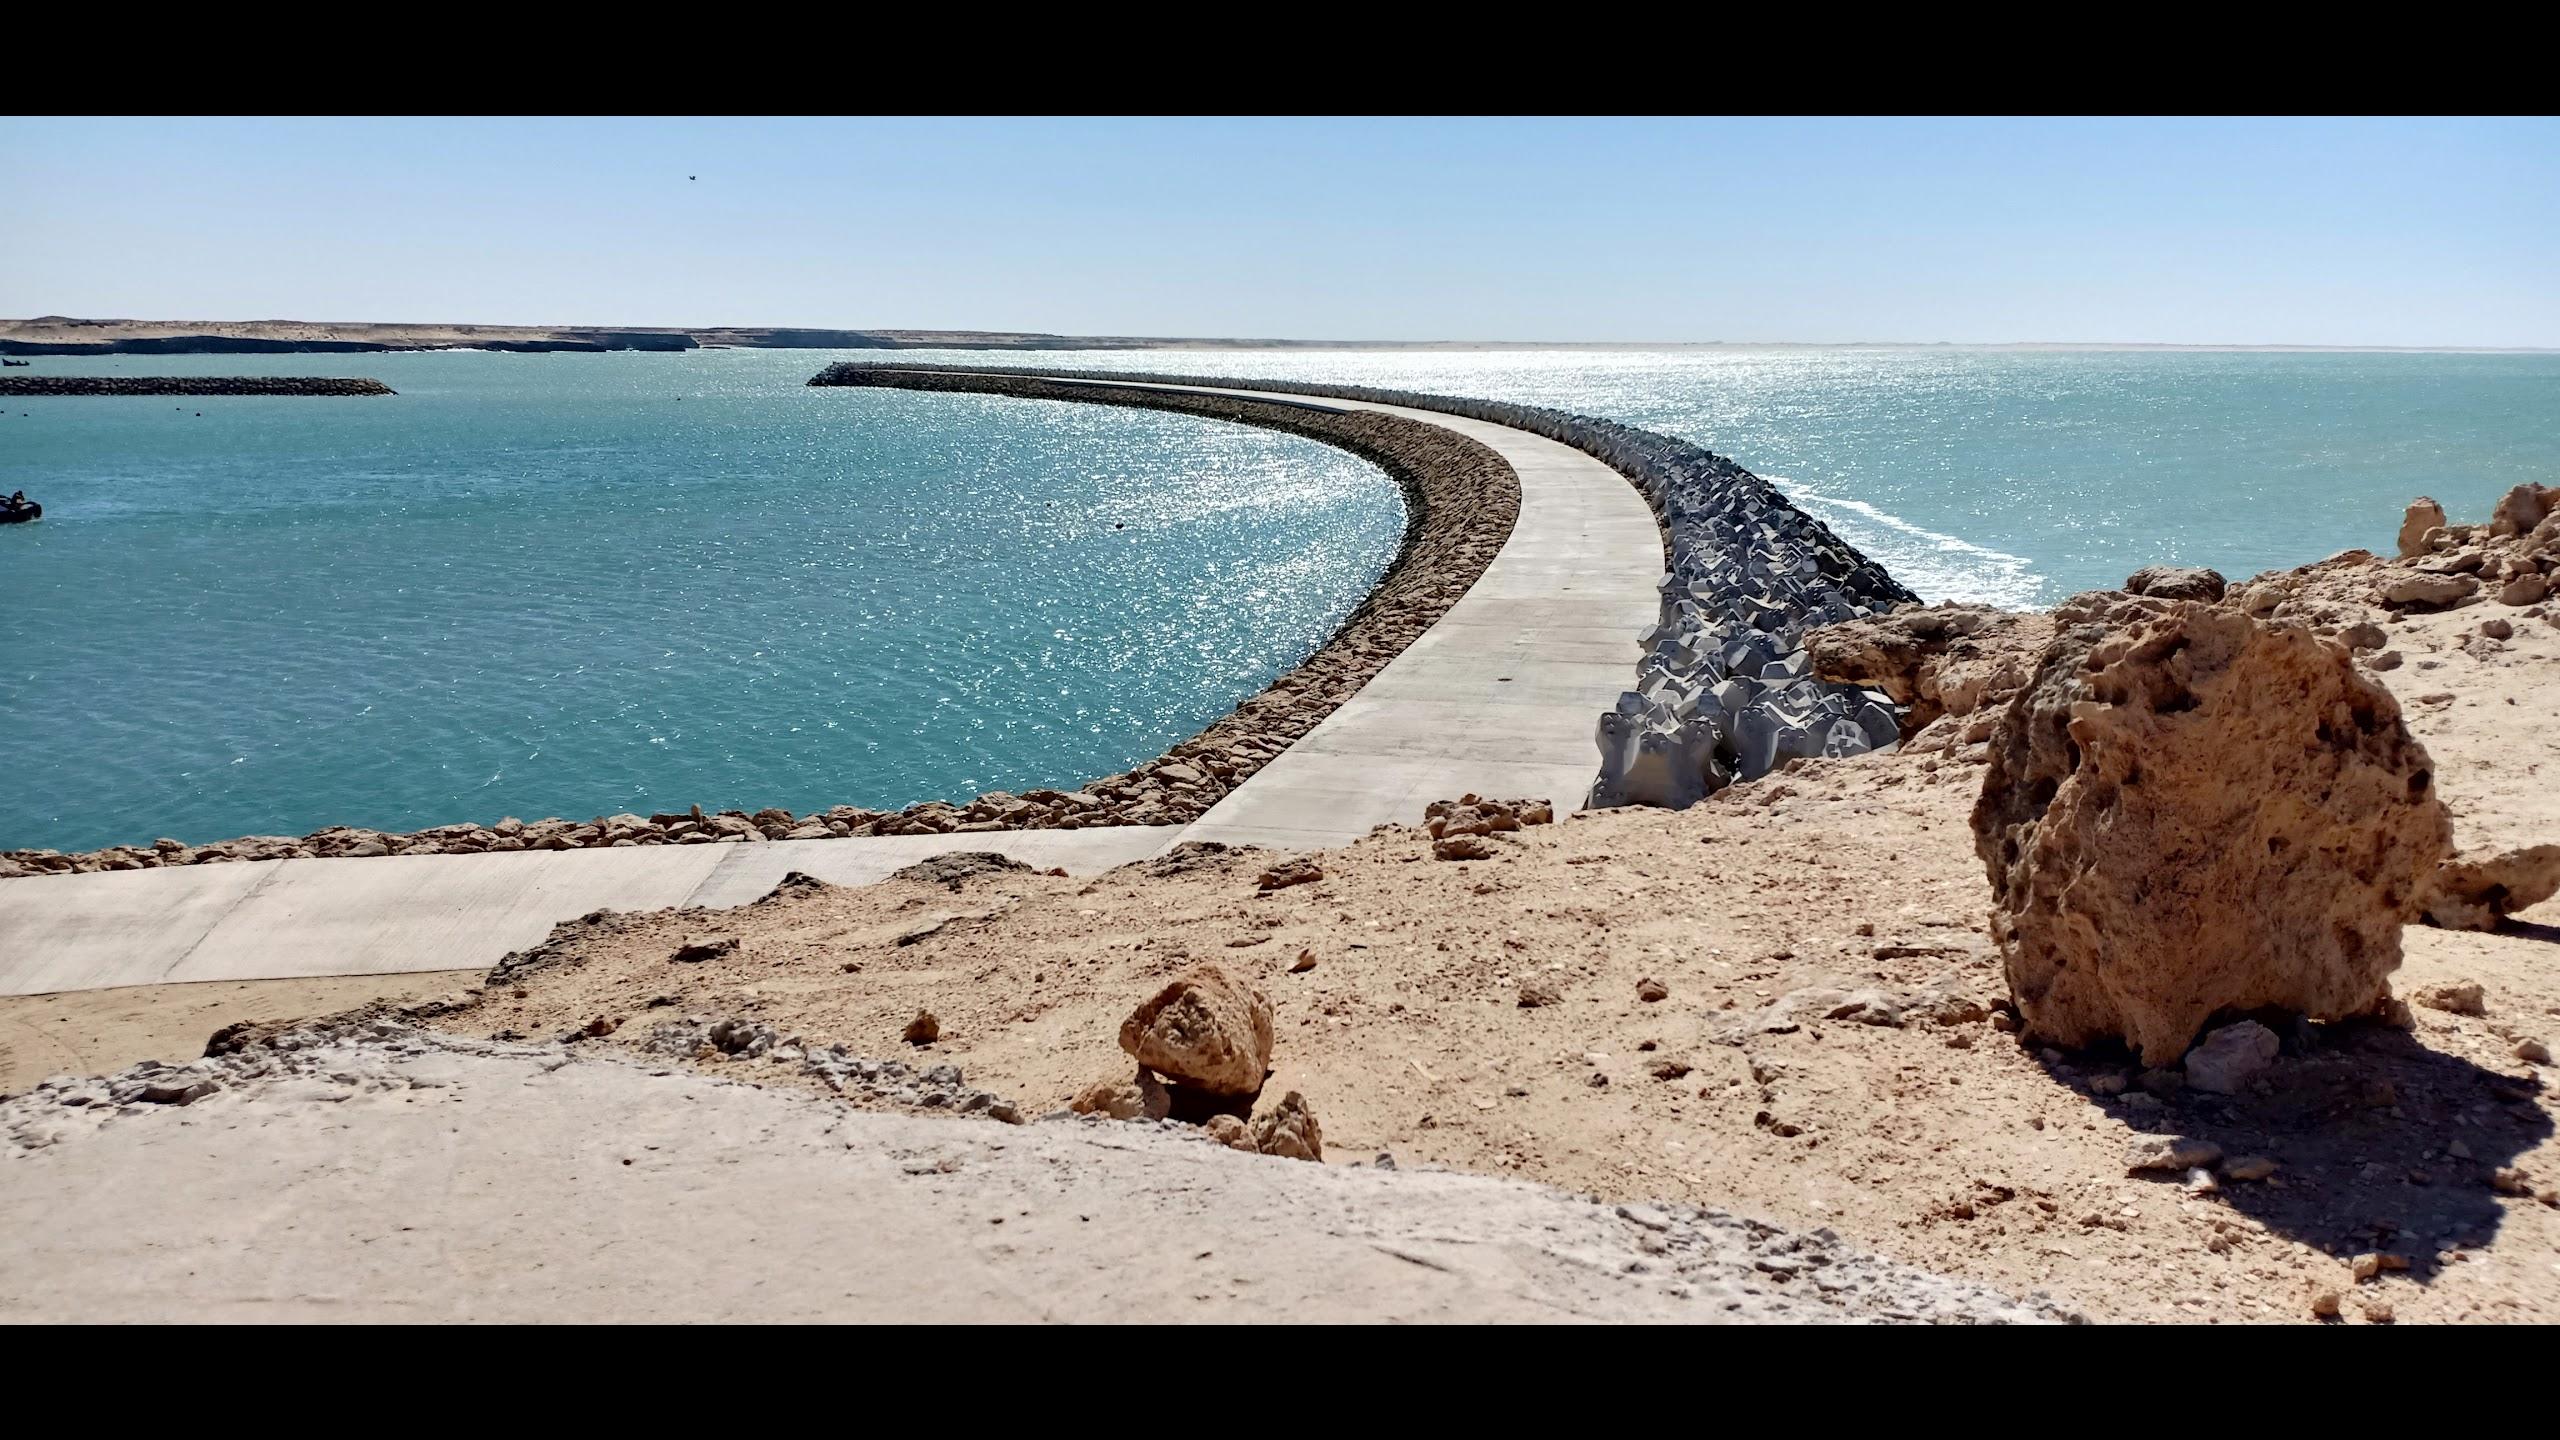 Actualités du Sahara Marocain - Page 15 AF1QipP0m1Gr8fCe_a7J84Xiof0uZA86bWHEEhNWNGQZ=w2560-h1440-pd